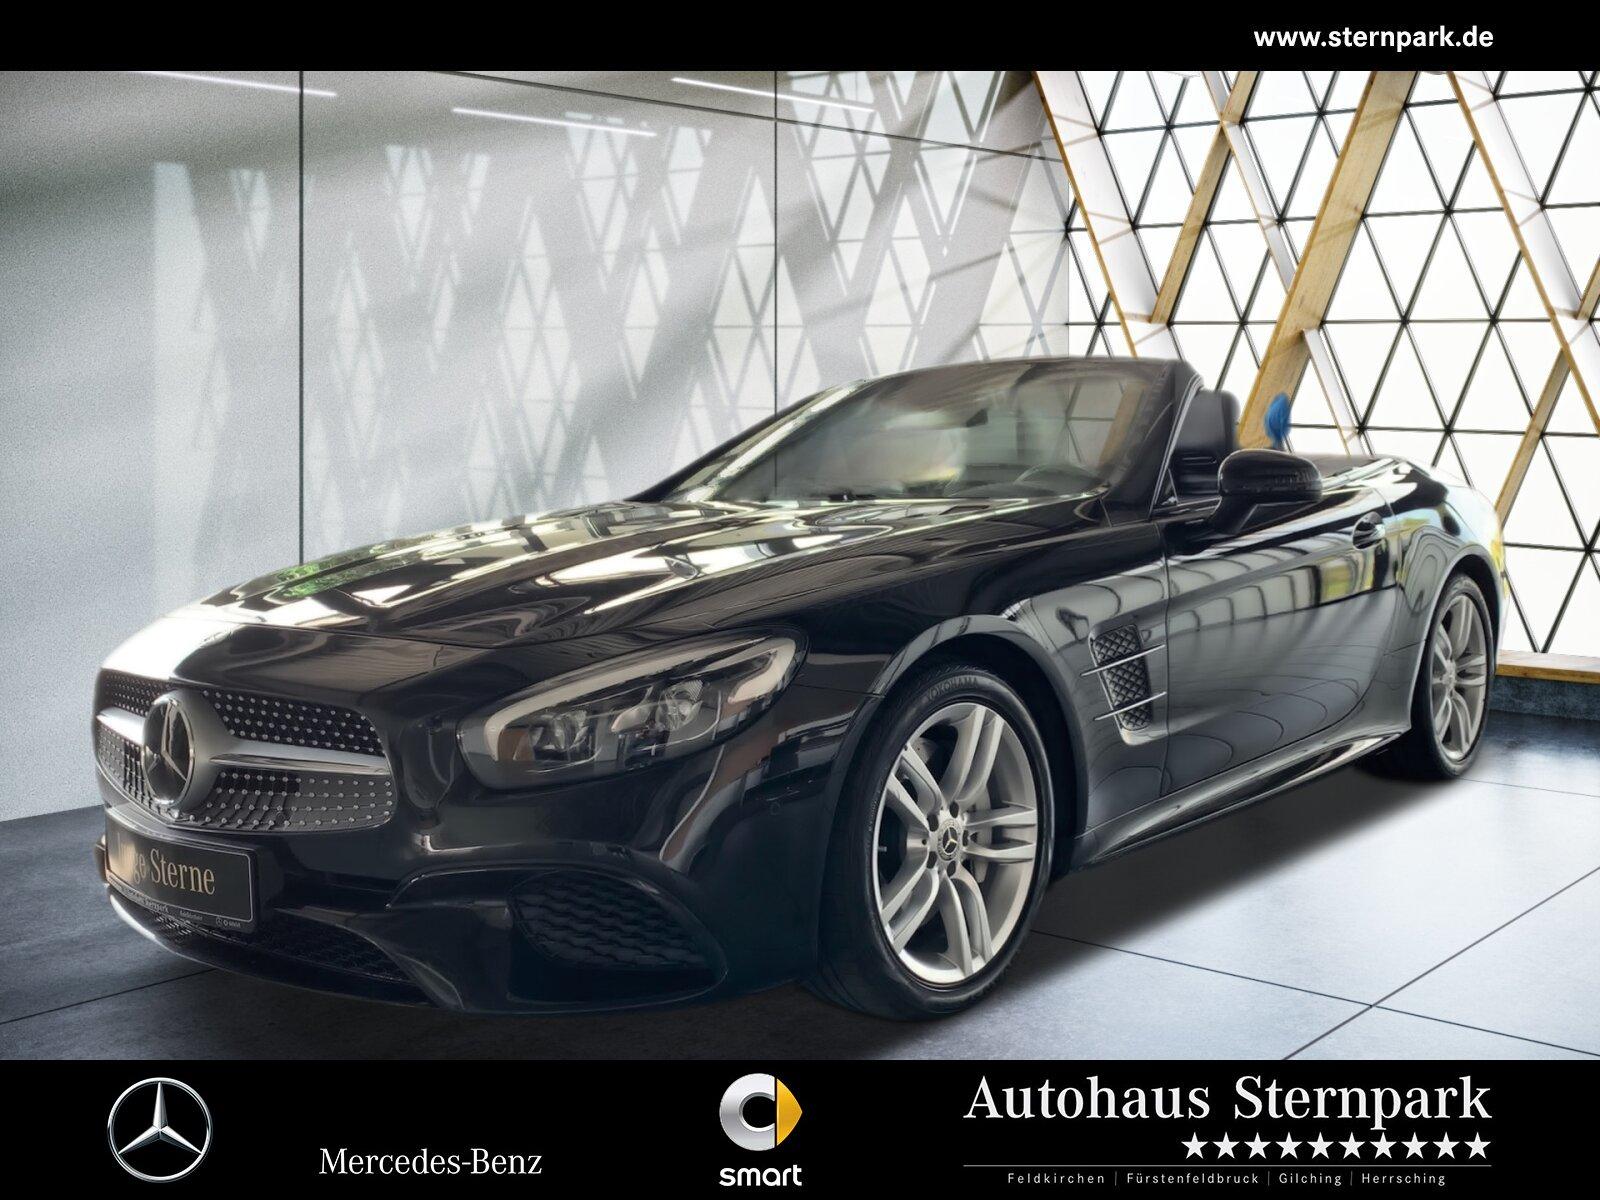 Mercedes-Benz SL 500 AMG Comand+Pano+Distronic+Kamera+Keyless+, Jahr 2017, Benzin